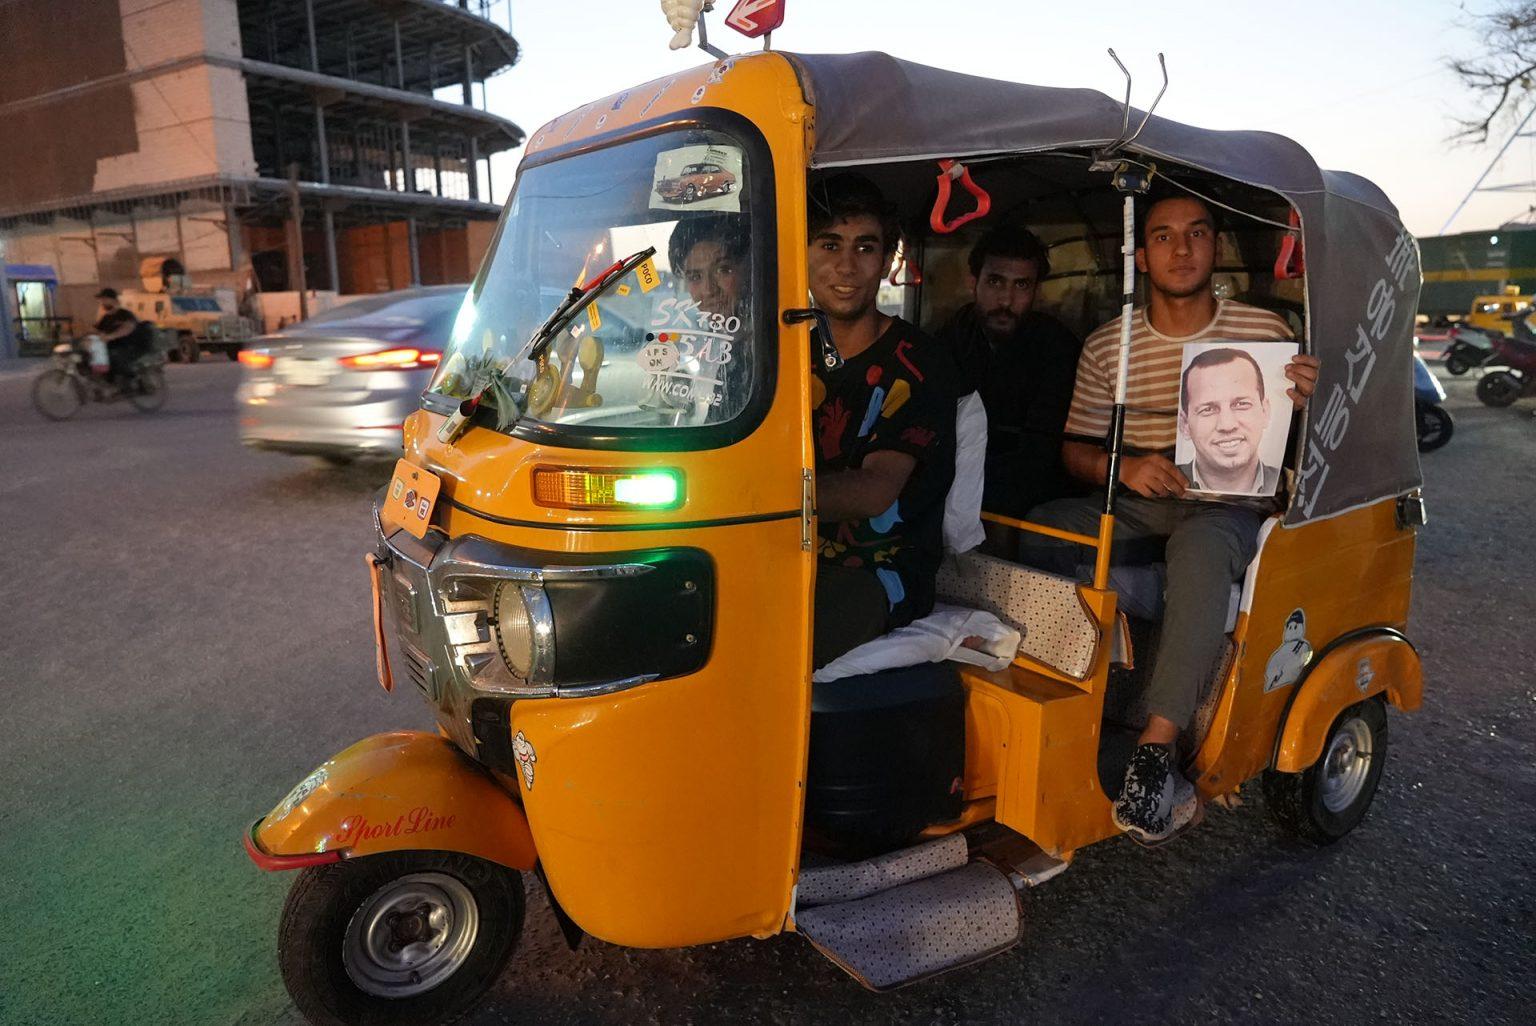 Young people in tuk-tuk in Basra display portrait of slain journalist